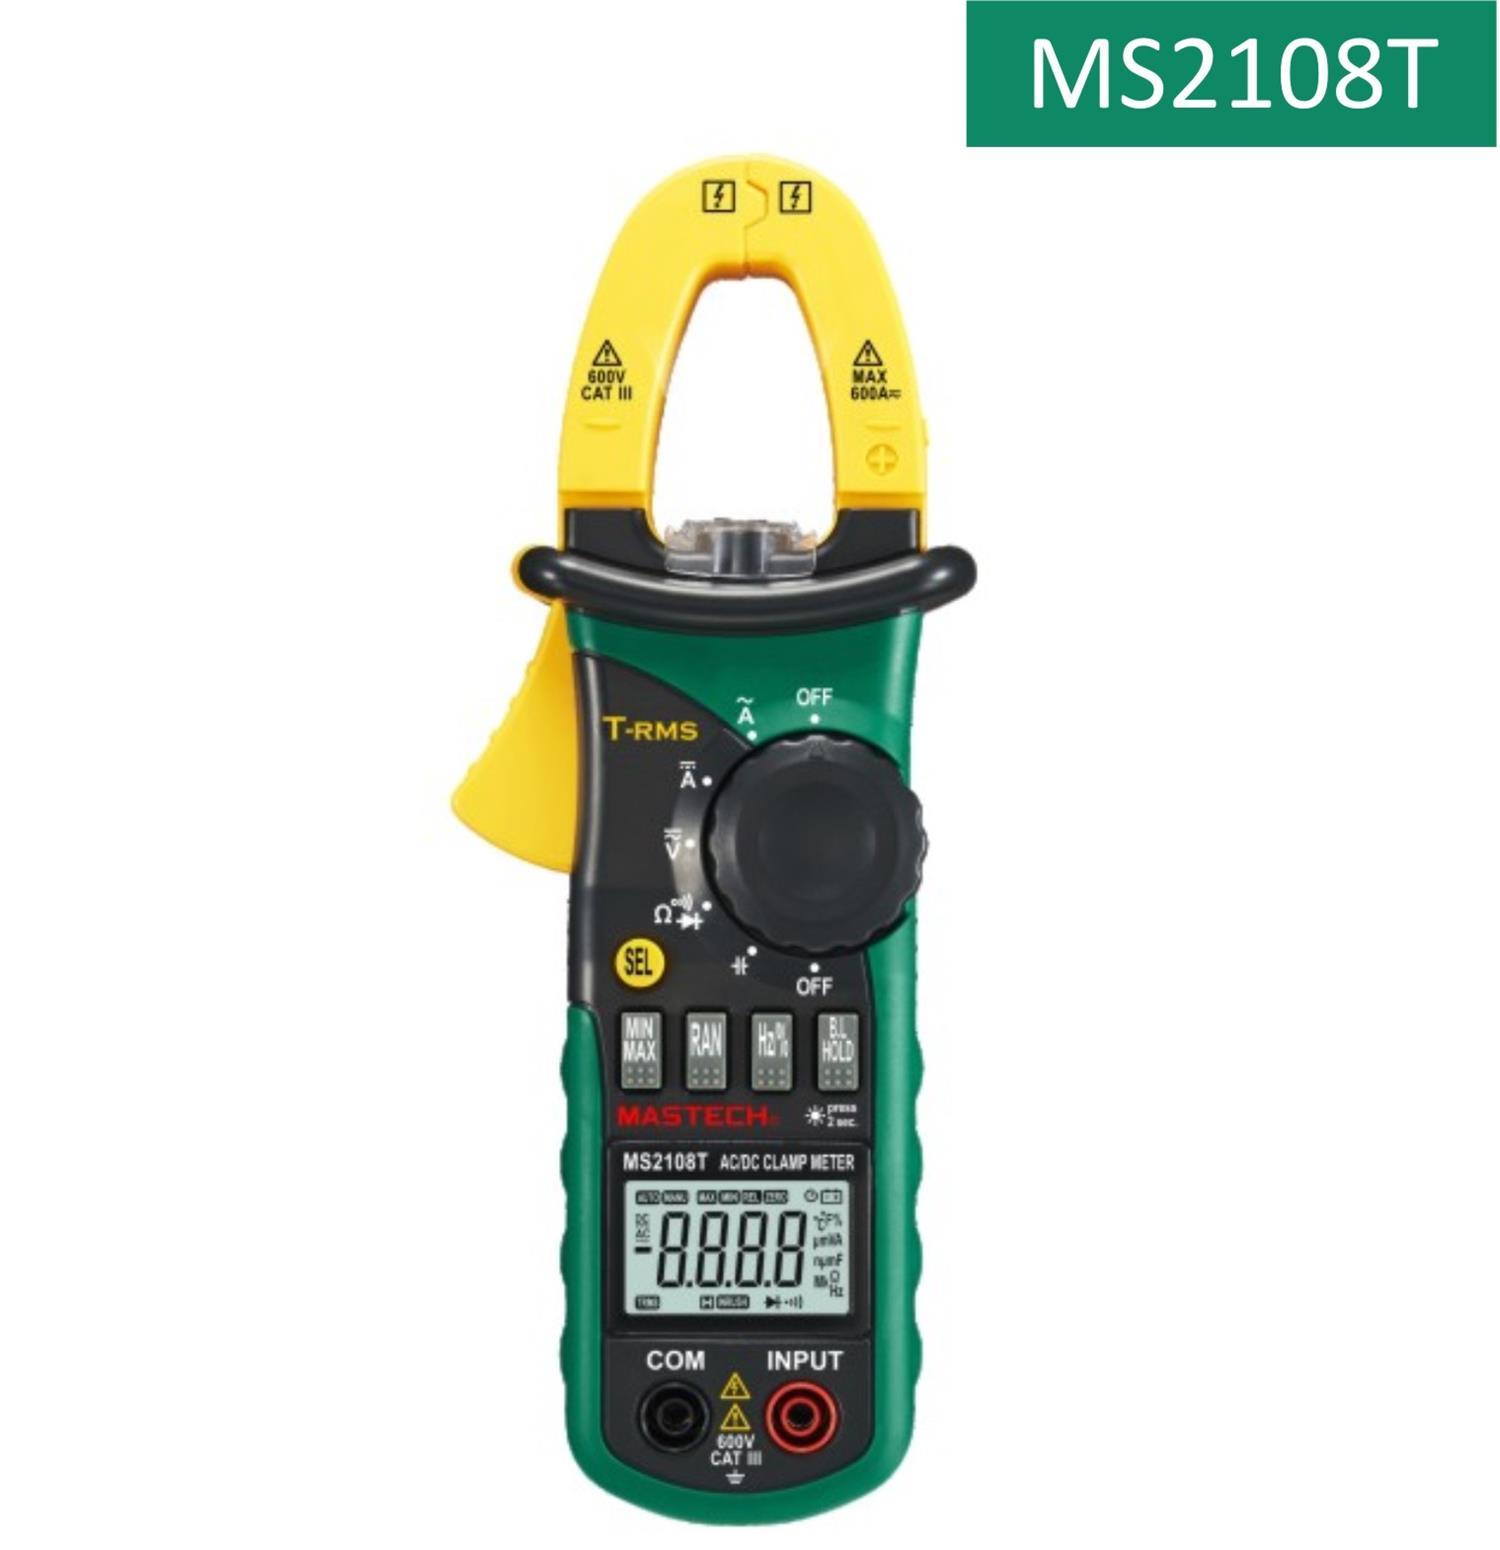 MS 2108T